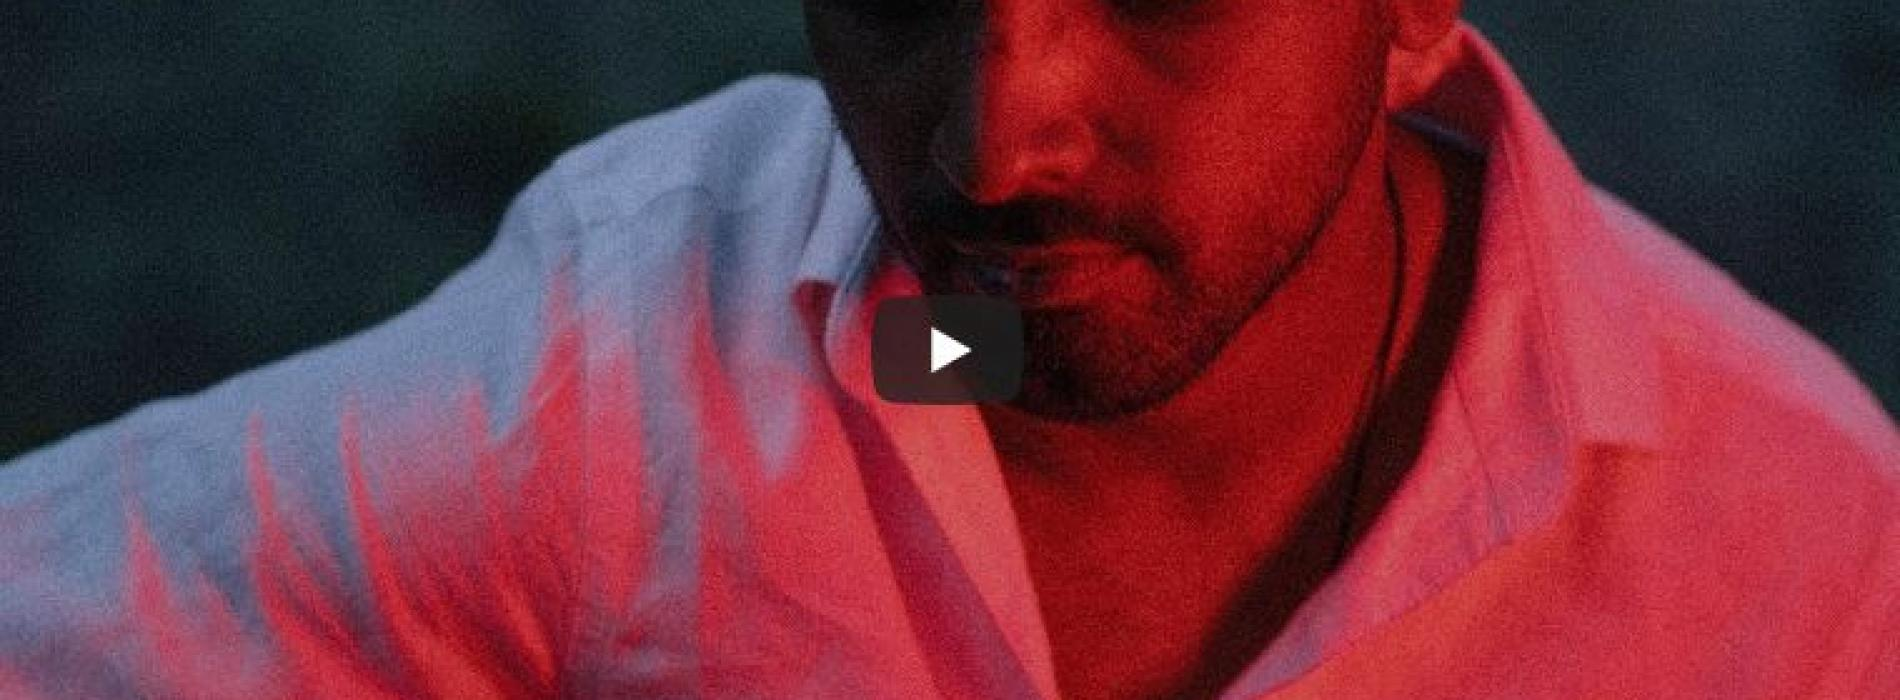 Lasith Fernando – Yana Maga – යන මග [Official Video]